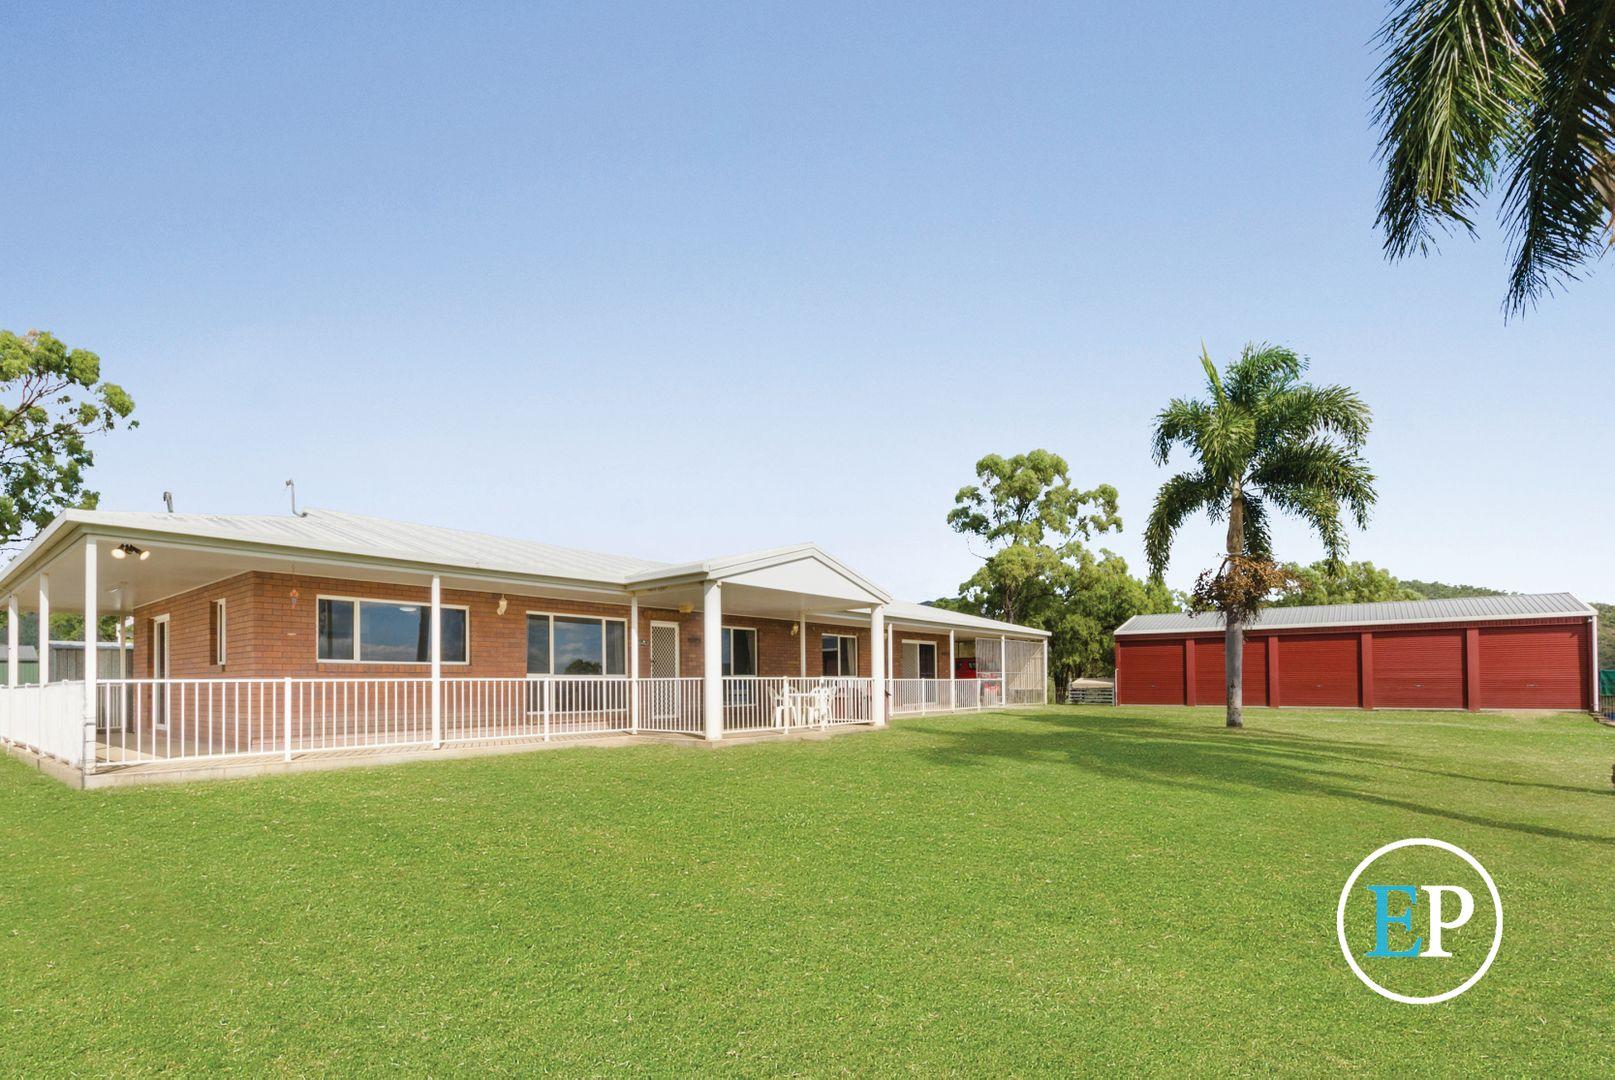 46 Dingo Park Road, Woodstock QLD 4816, Image 0